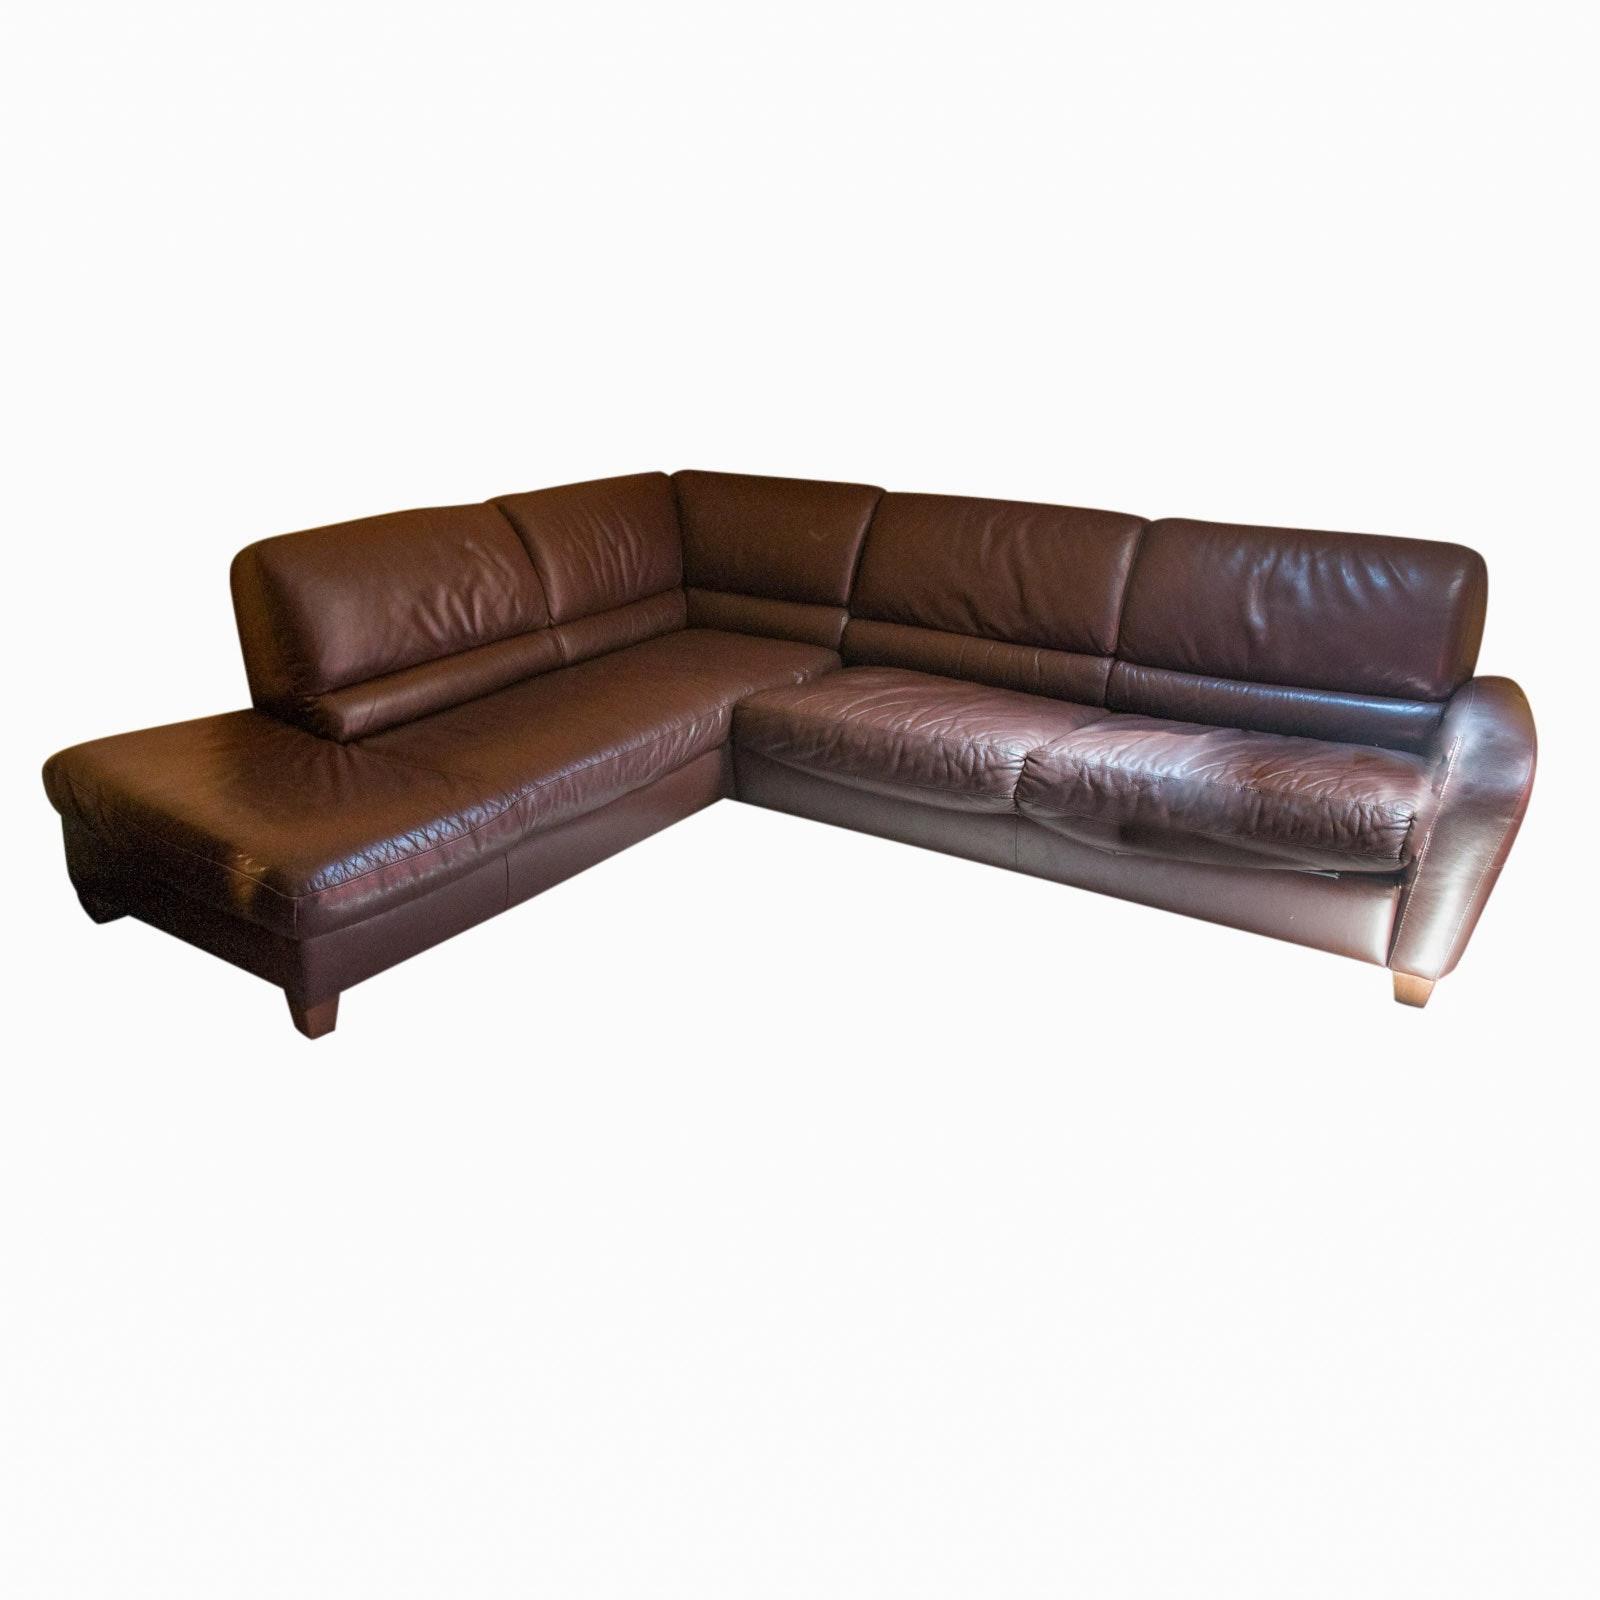 Italsofa Sectional Leather Sofa ...